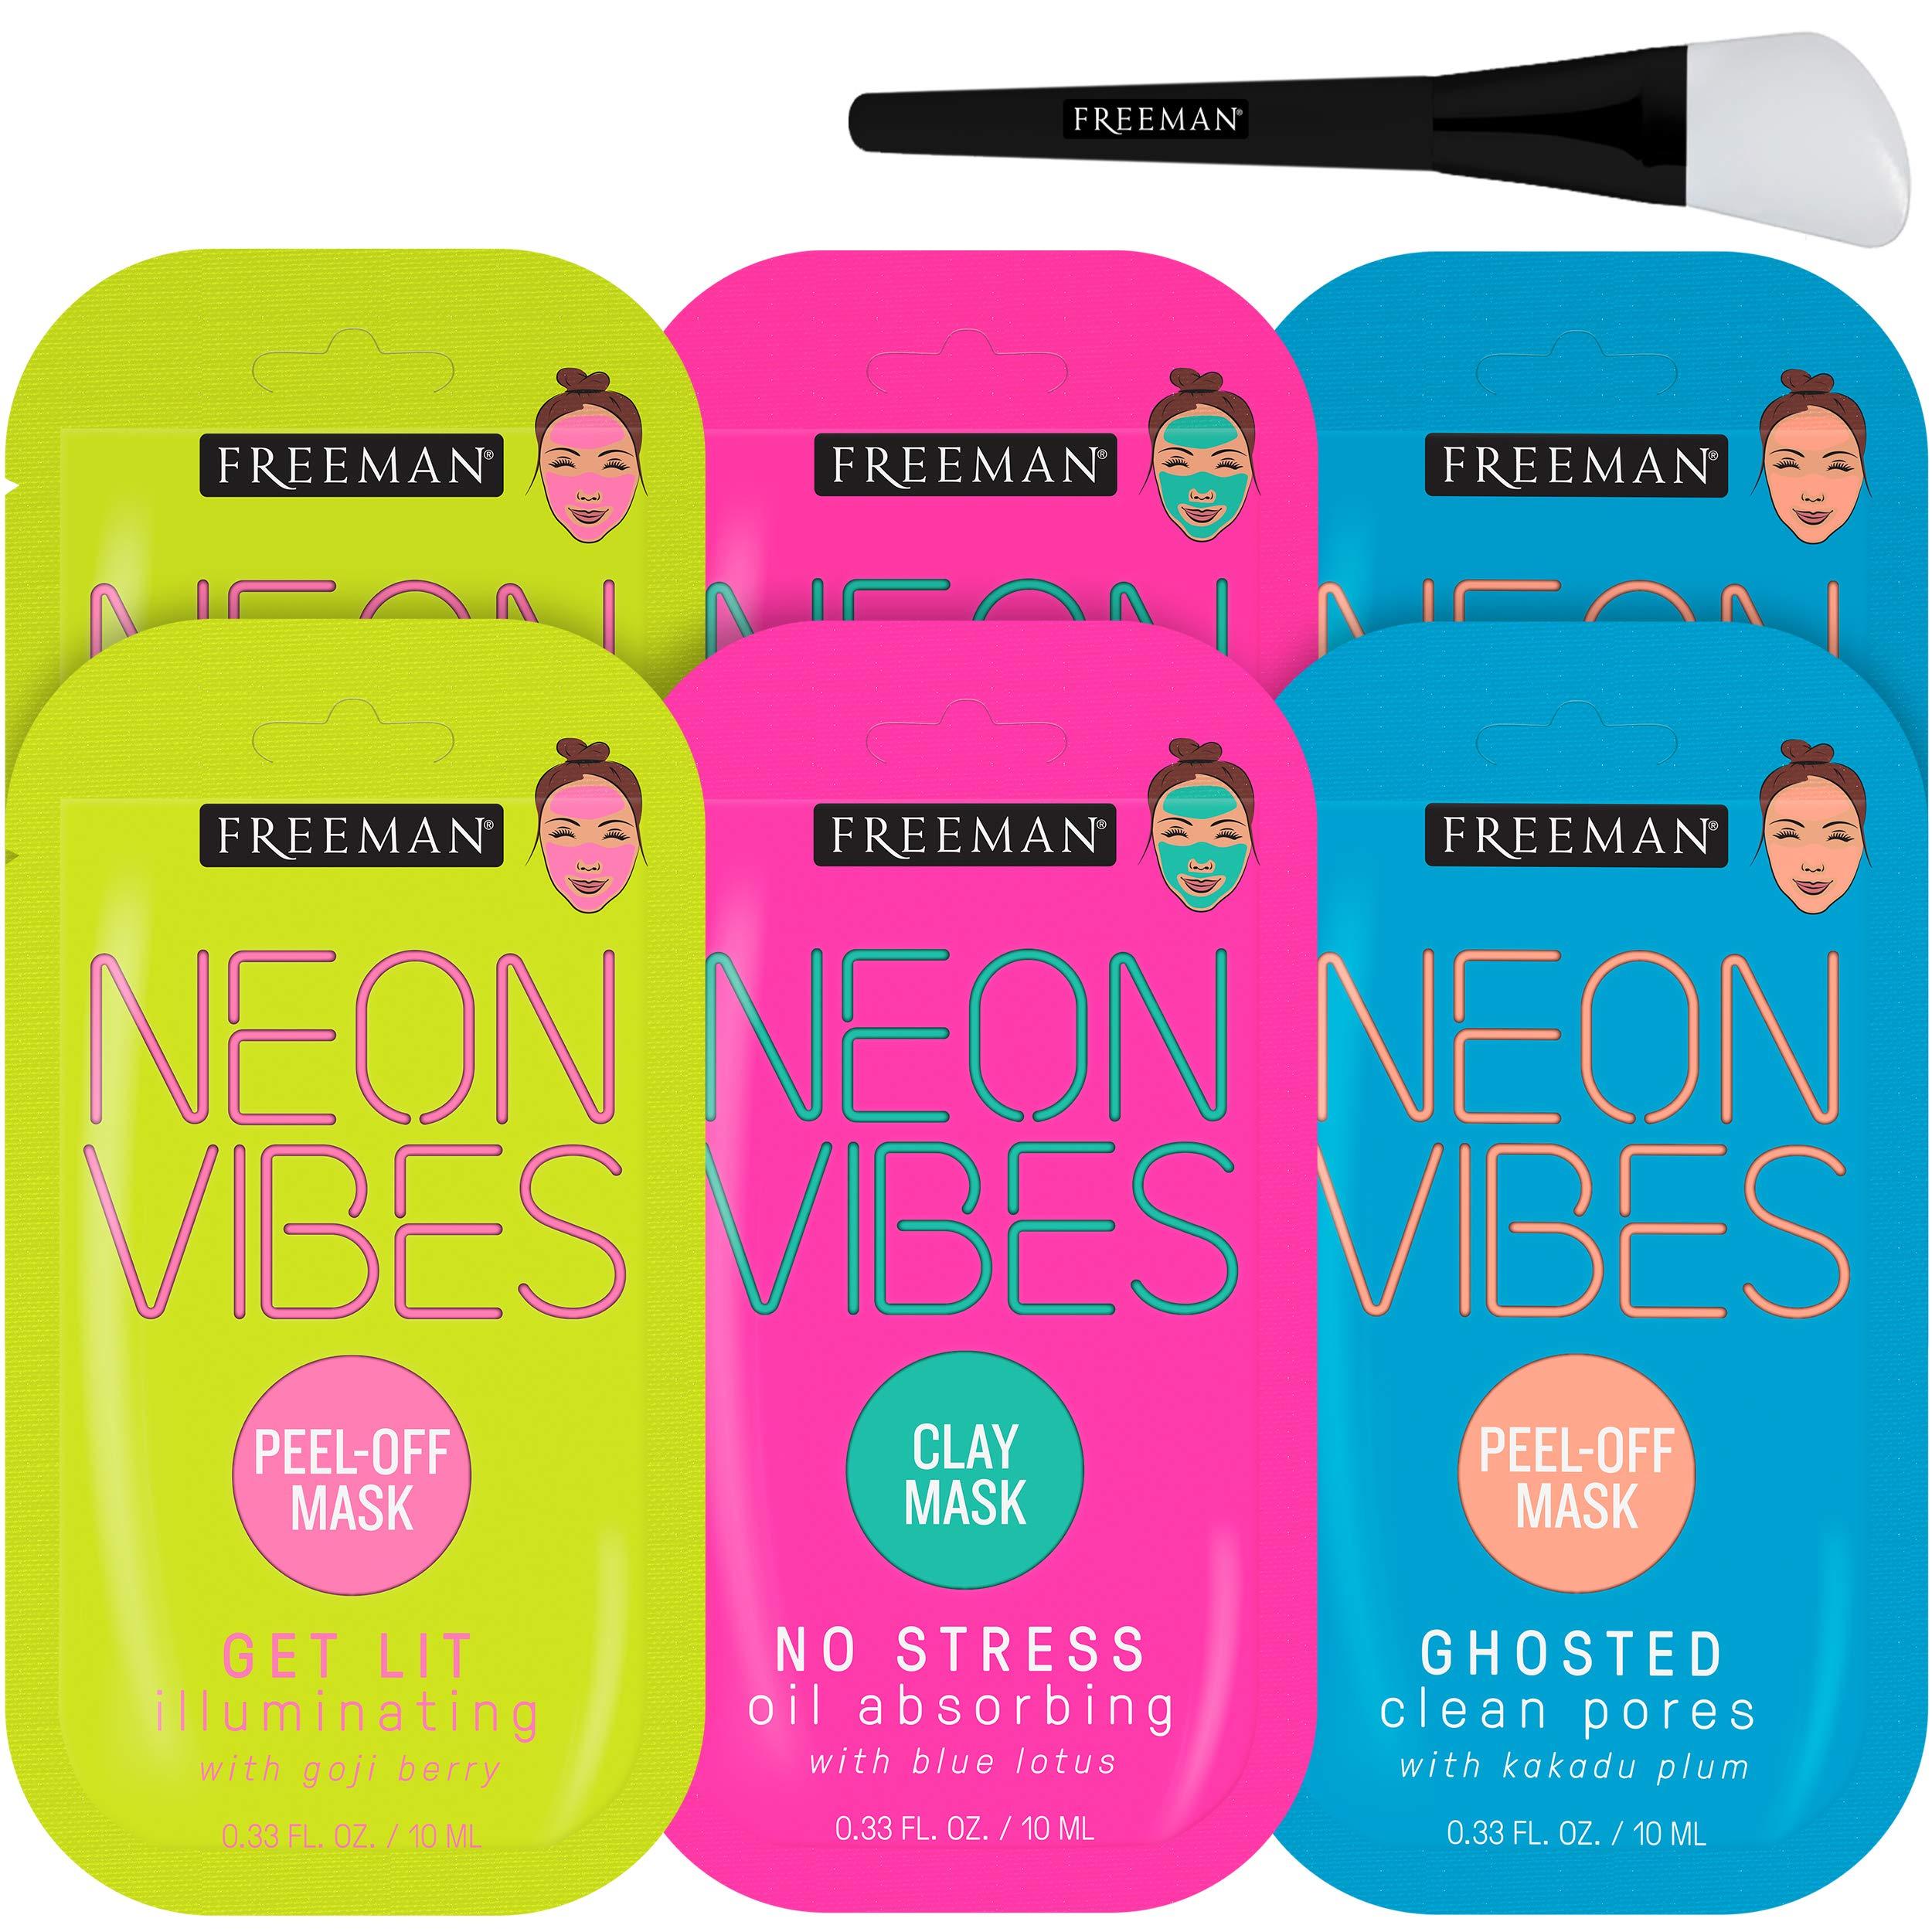 Freeman - Neon Mask Collection